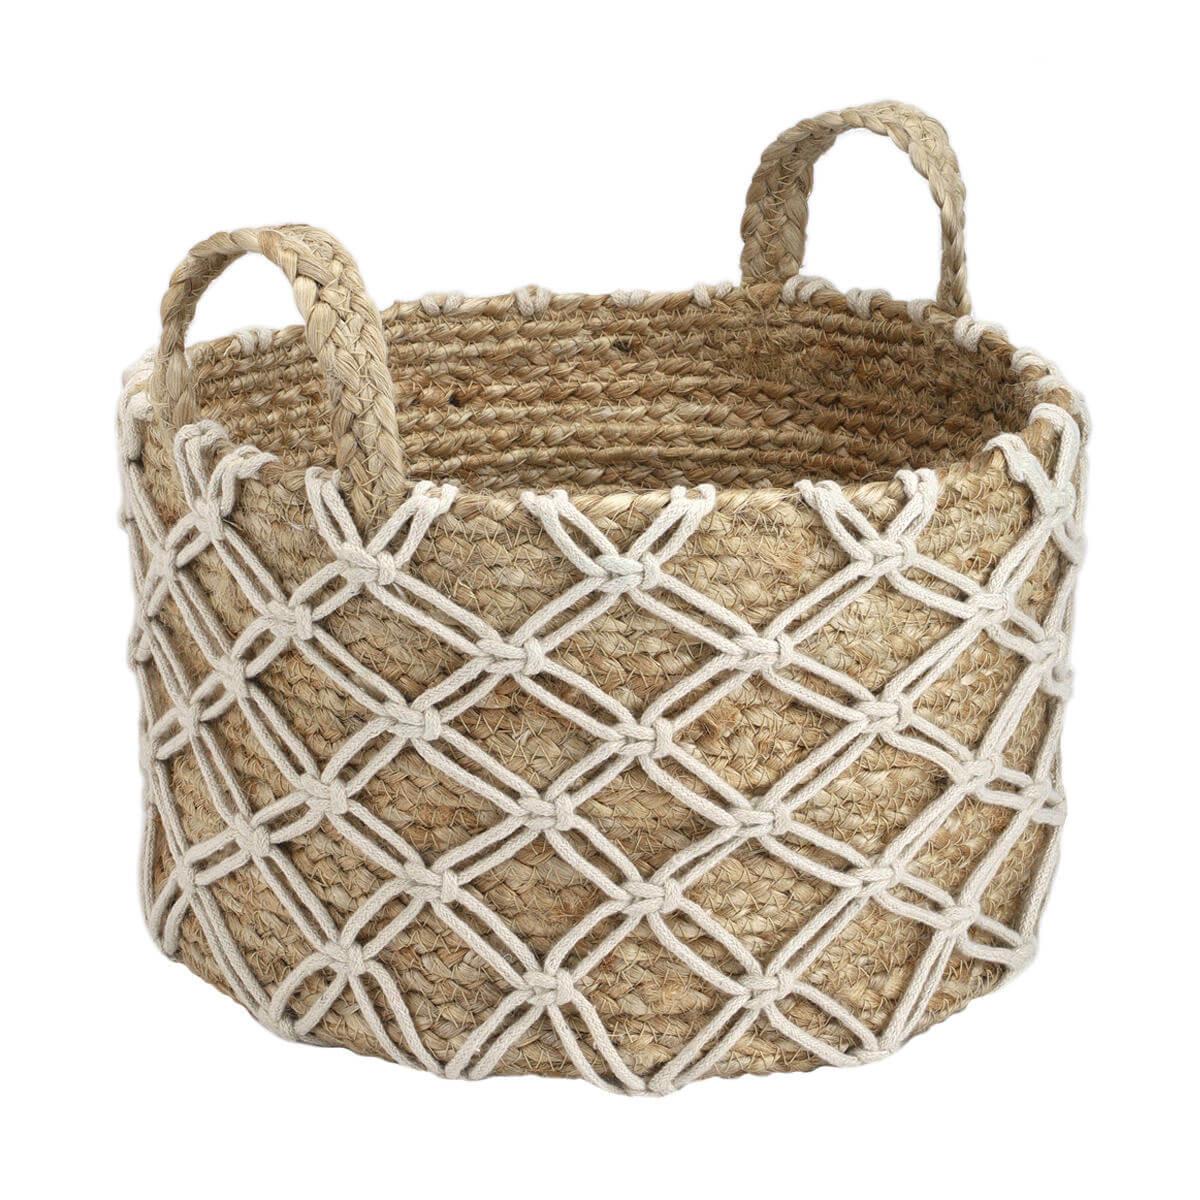 Macrame Basket Kmart.jpg